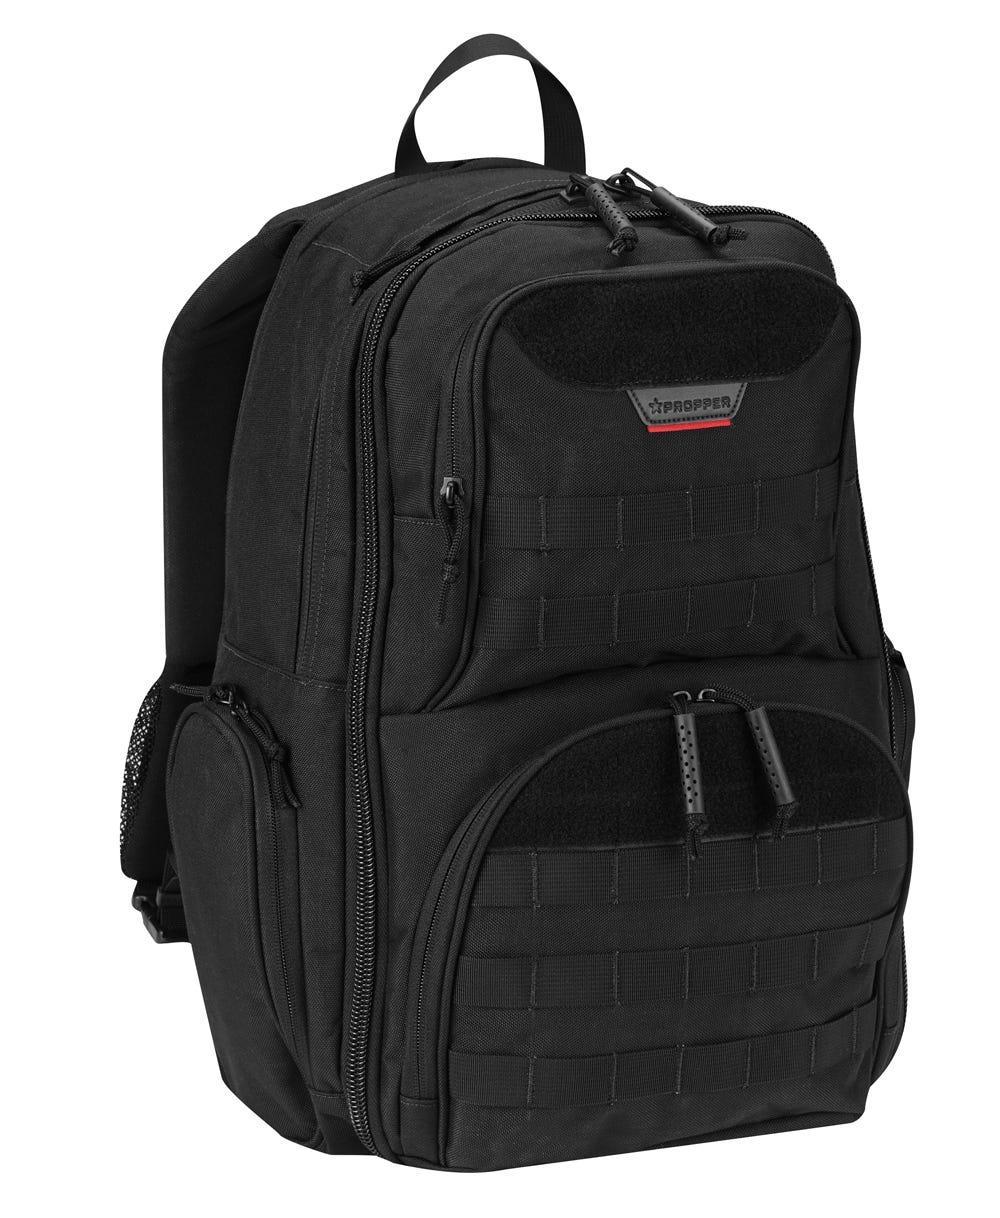 Propper Expandable Backpack-Propper